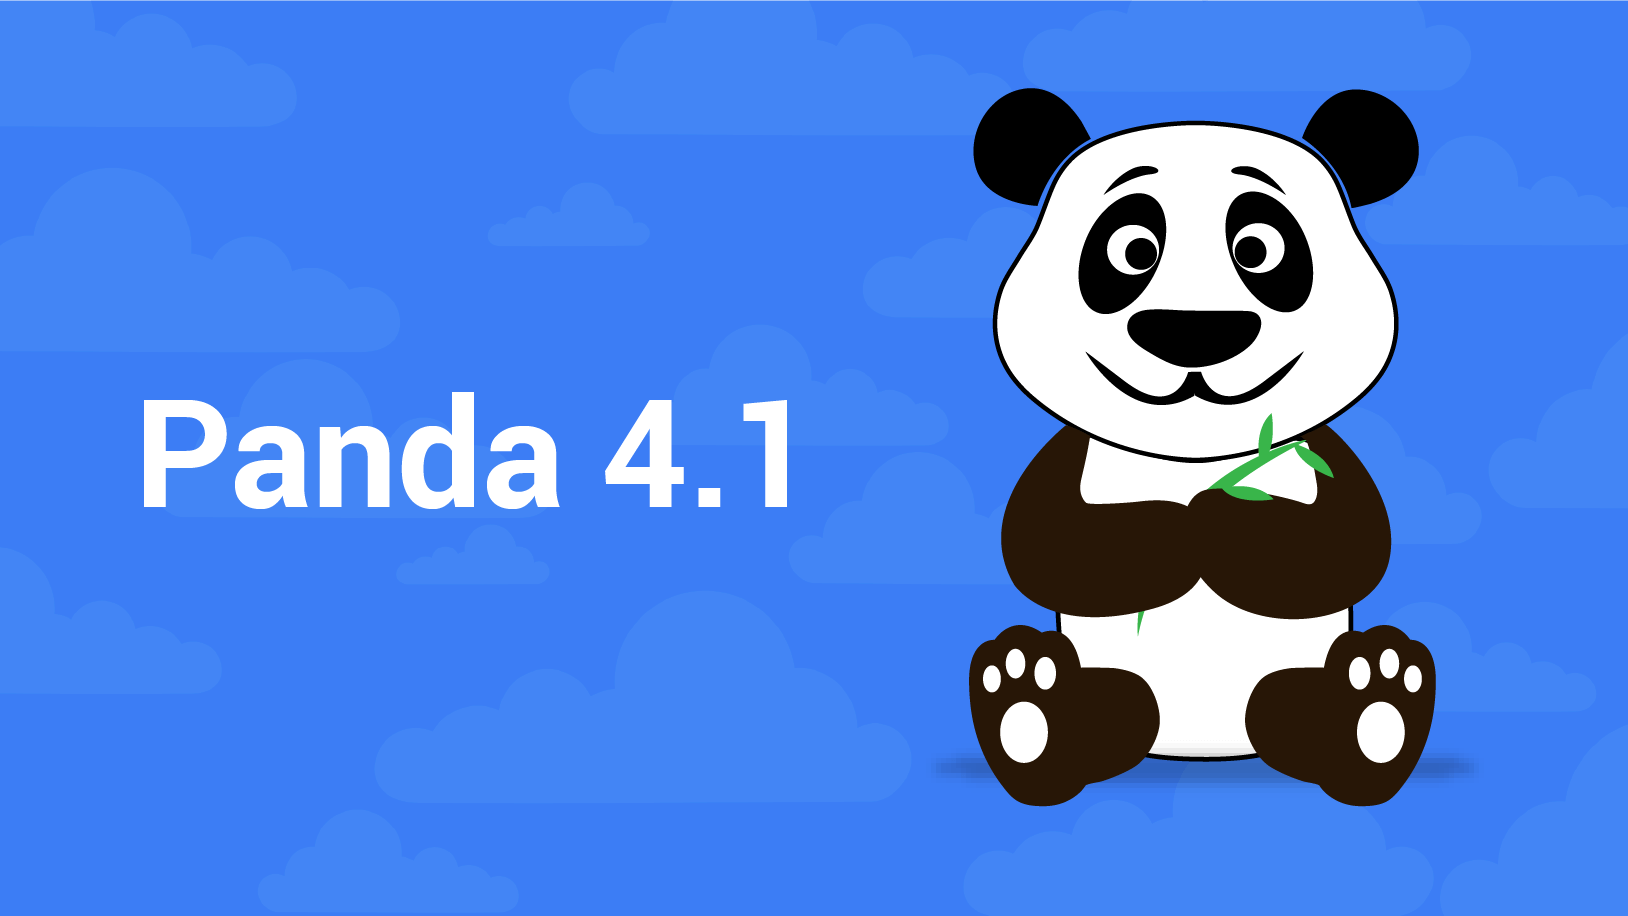 Google Panda 4.1 update